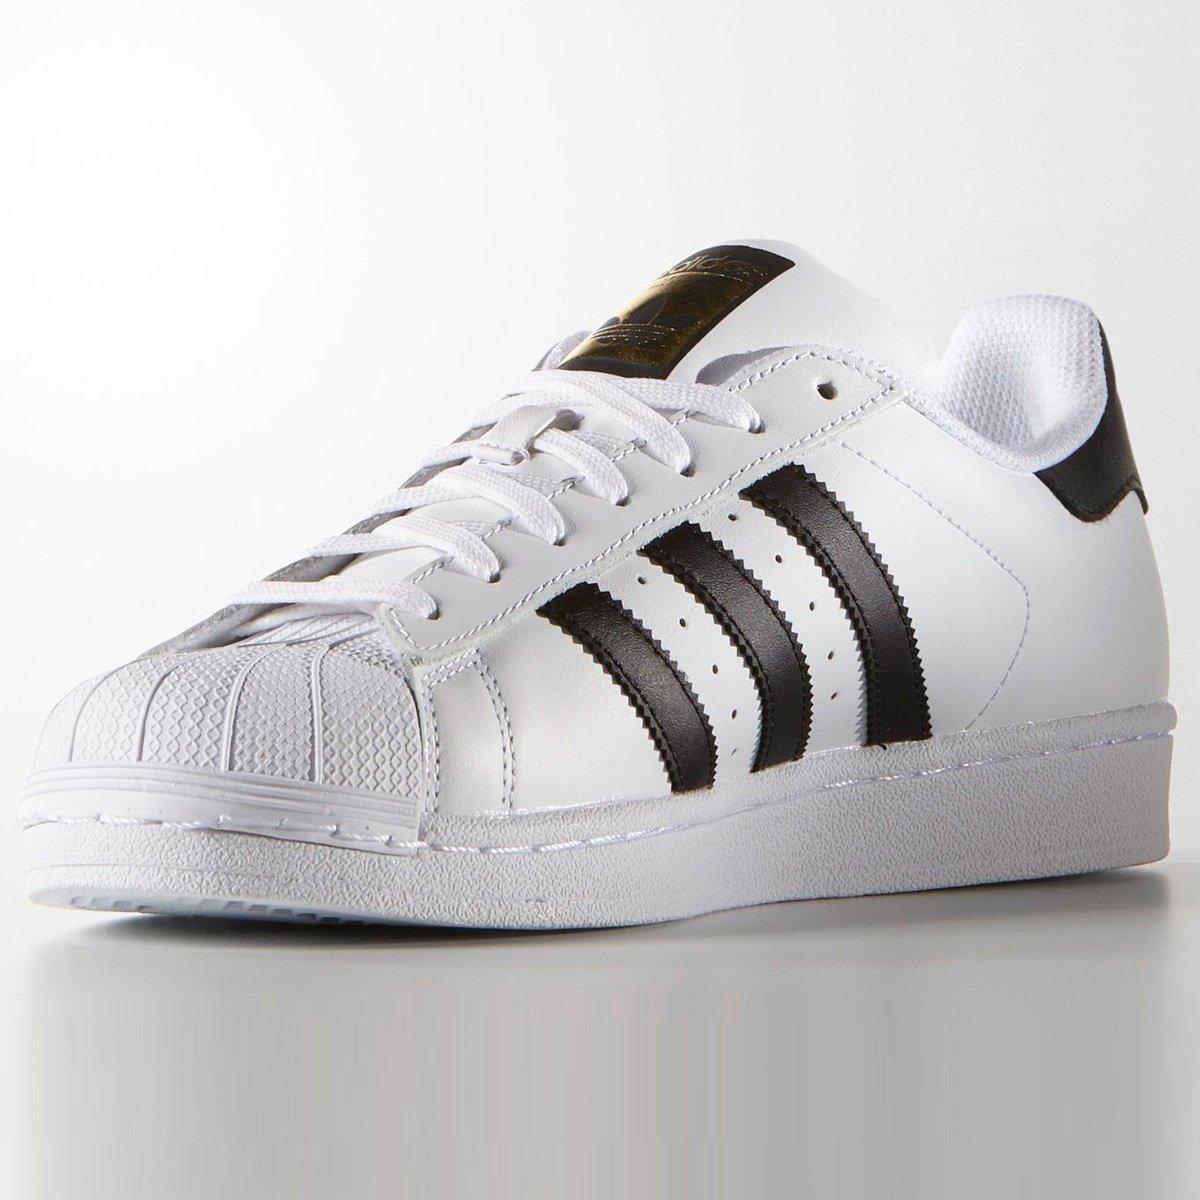 adidas (アディダス) スーパースター adidas Originals SUPERSTAR C77124 BB2246 BZ0190 B06Y1FYXXS 26.5 cm|ホワイト ホワイト 26.5 cm